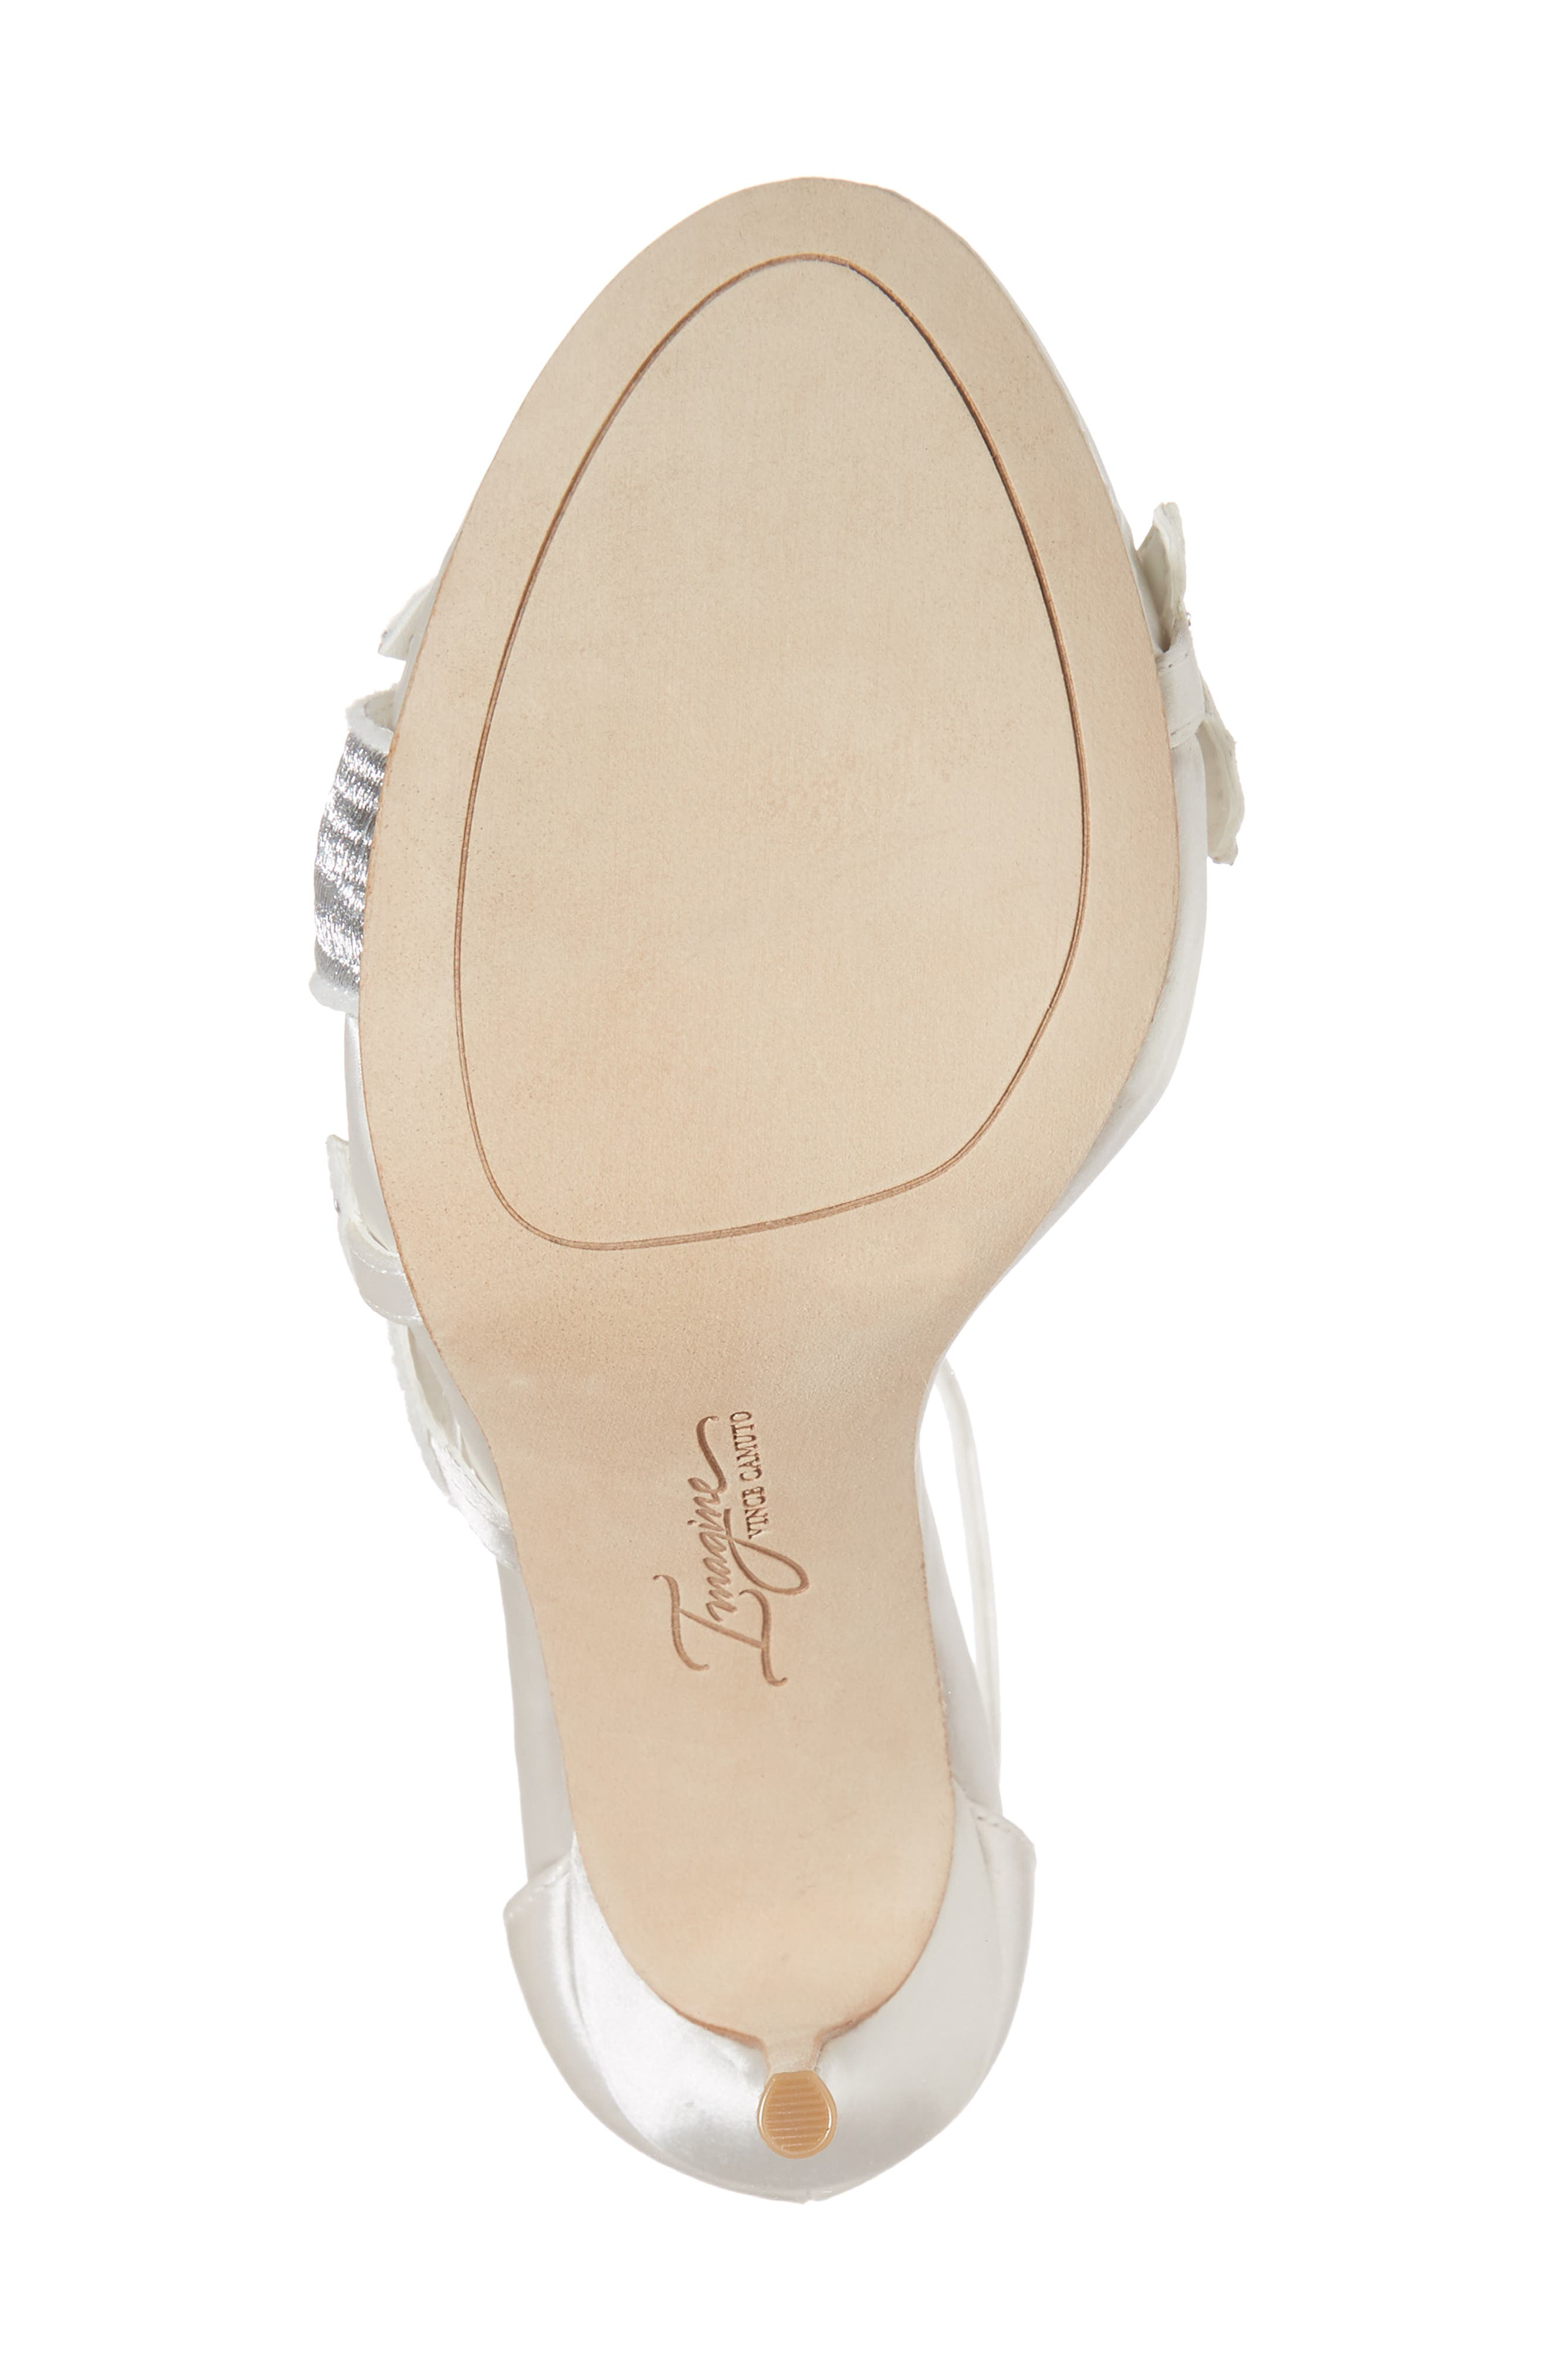 Imagine Vince Camuto Dayanara Embellished Sandal,                             Alternate thumbnail 6, color,                             PURE WHITE SATIN